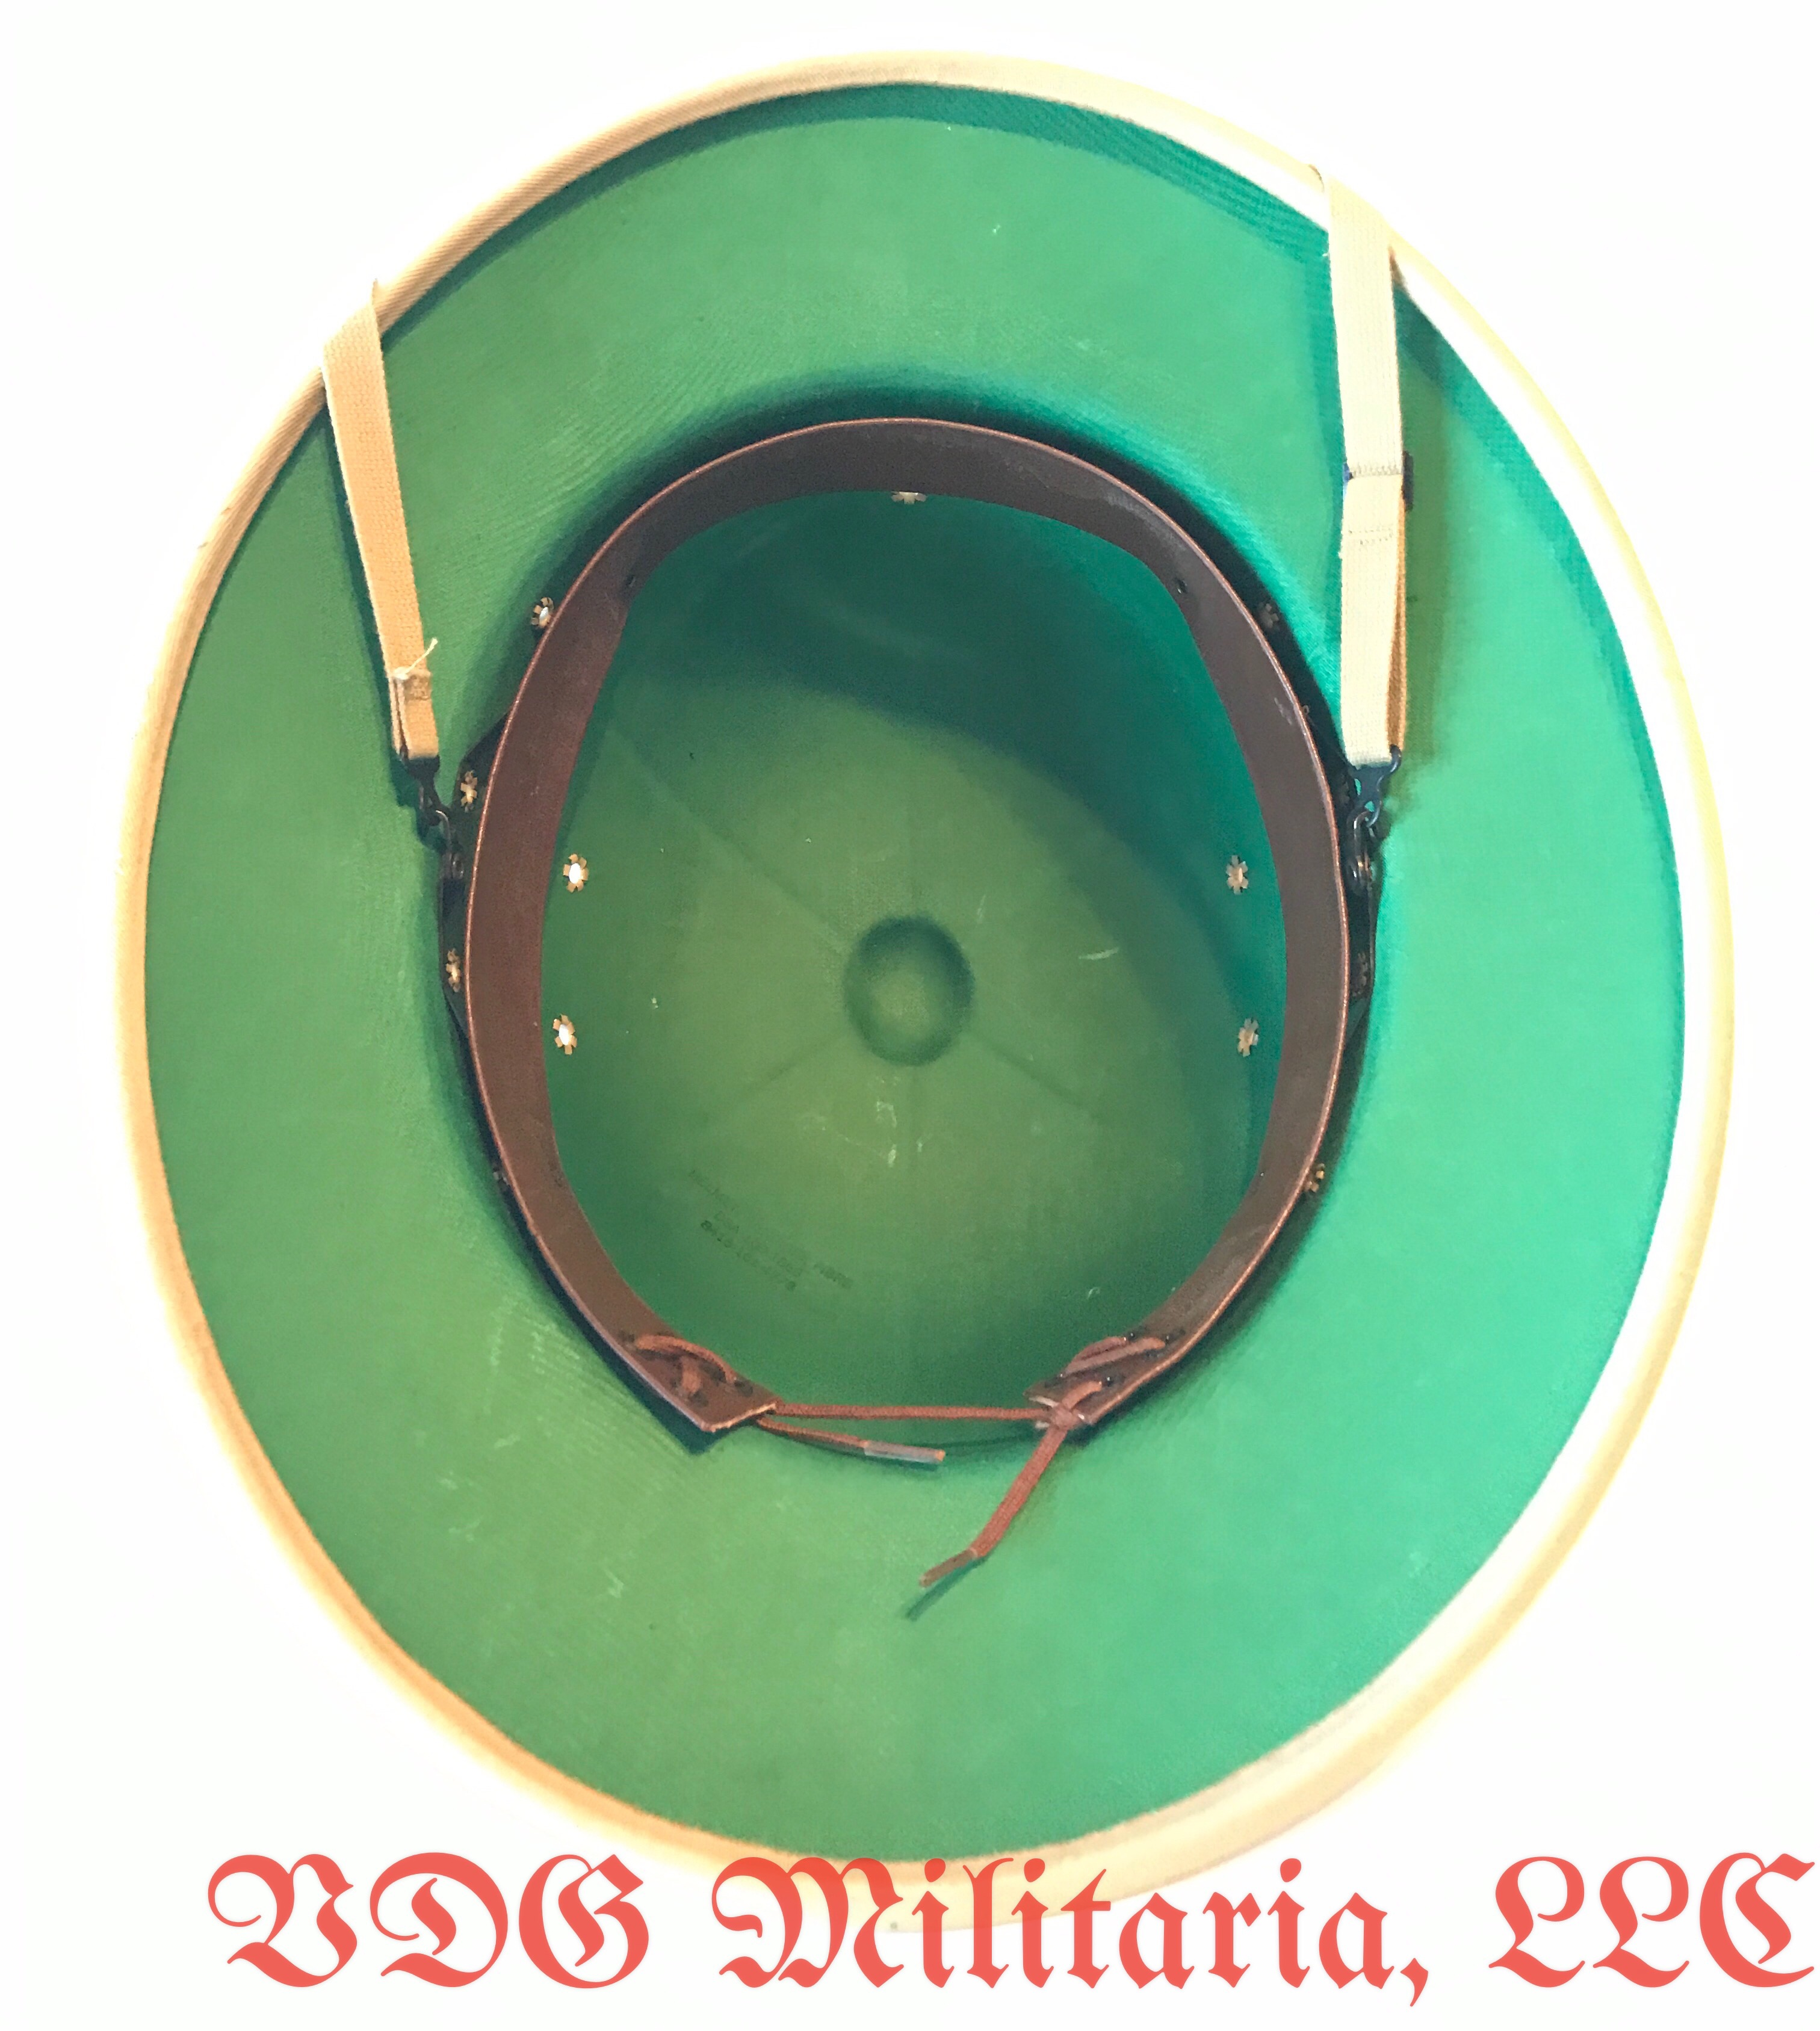 watermarked32016-11-15-1446